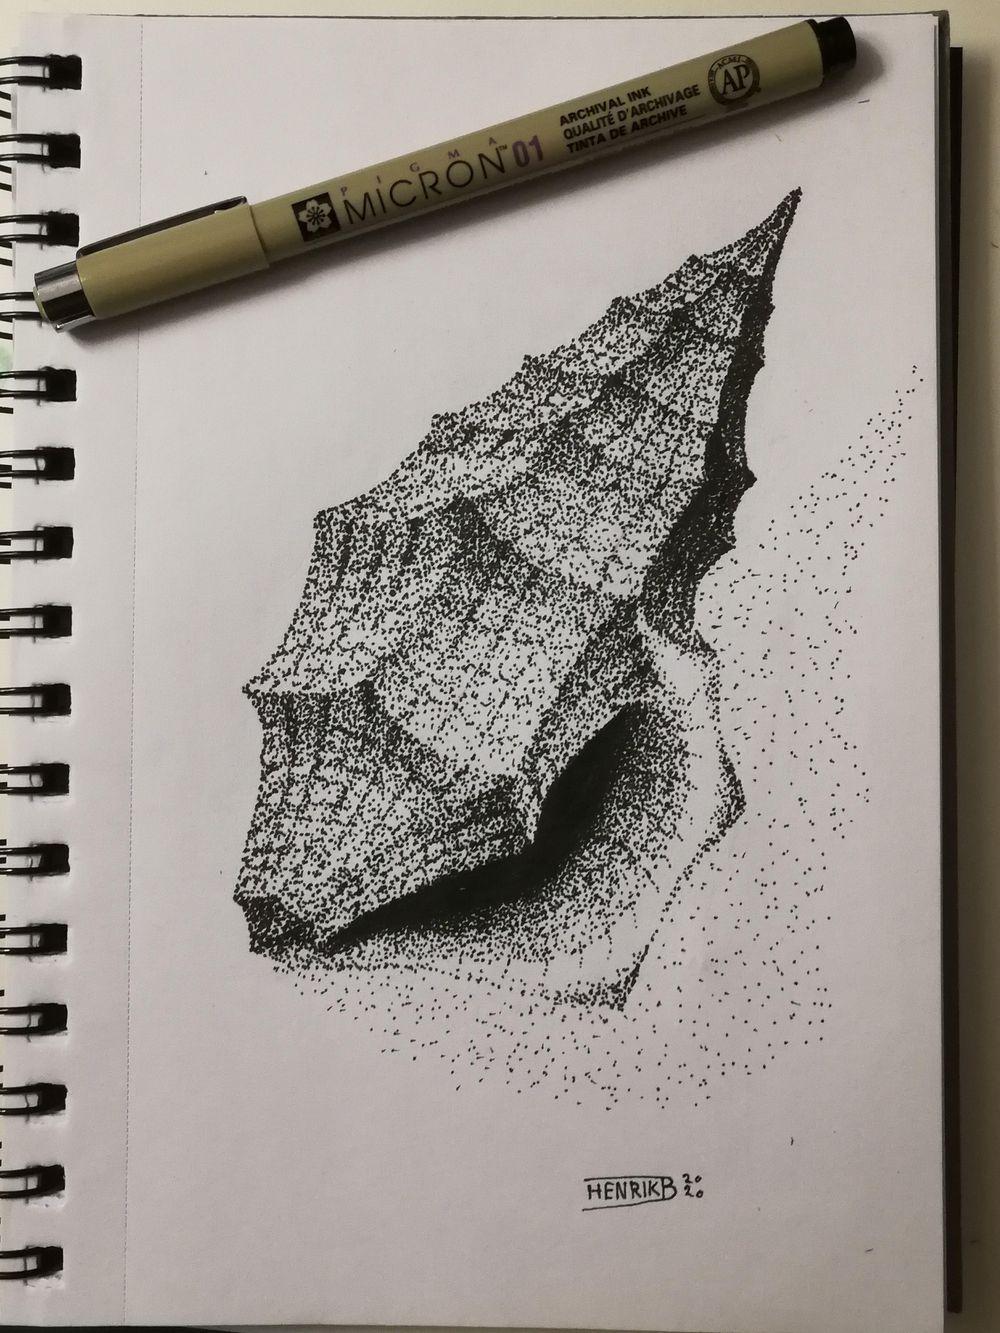 Seashell - image 4 - student project